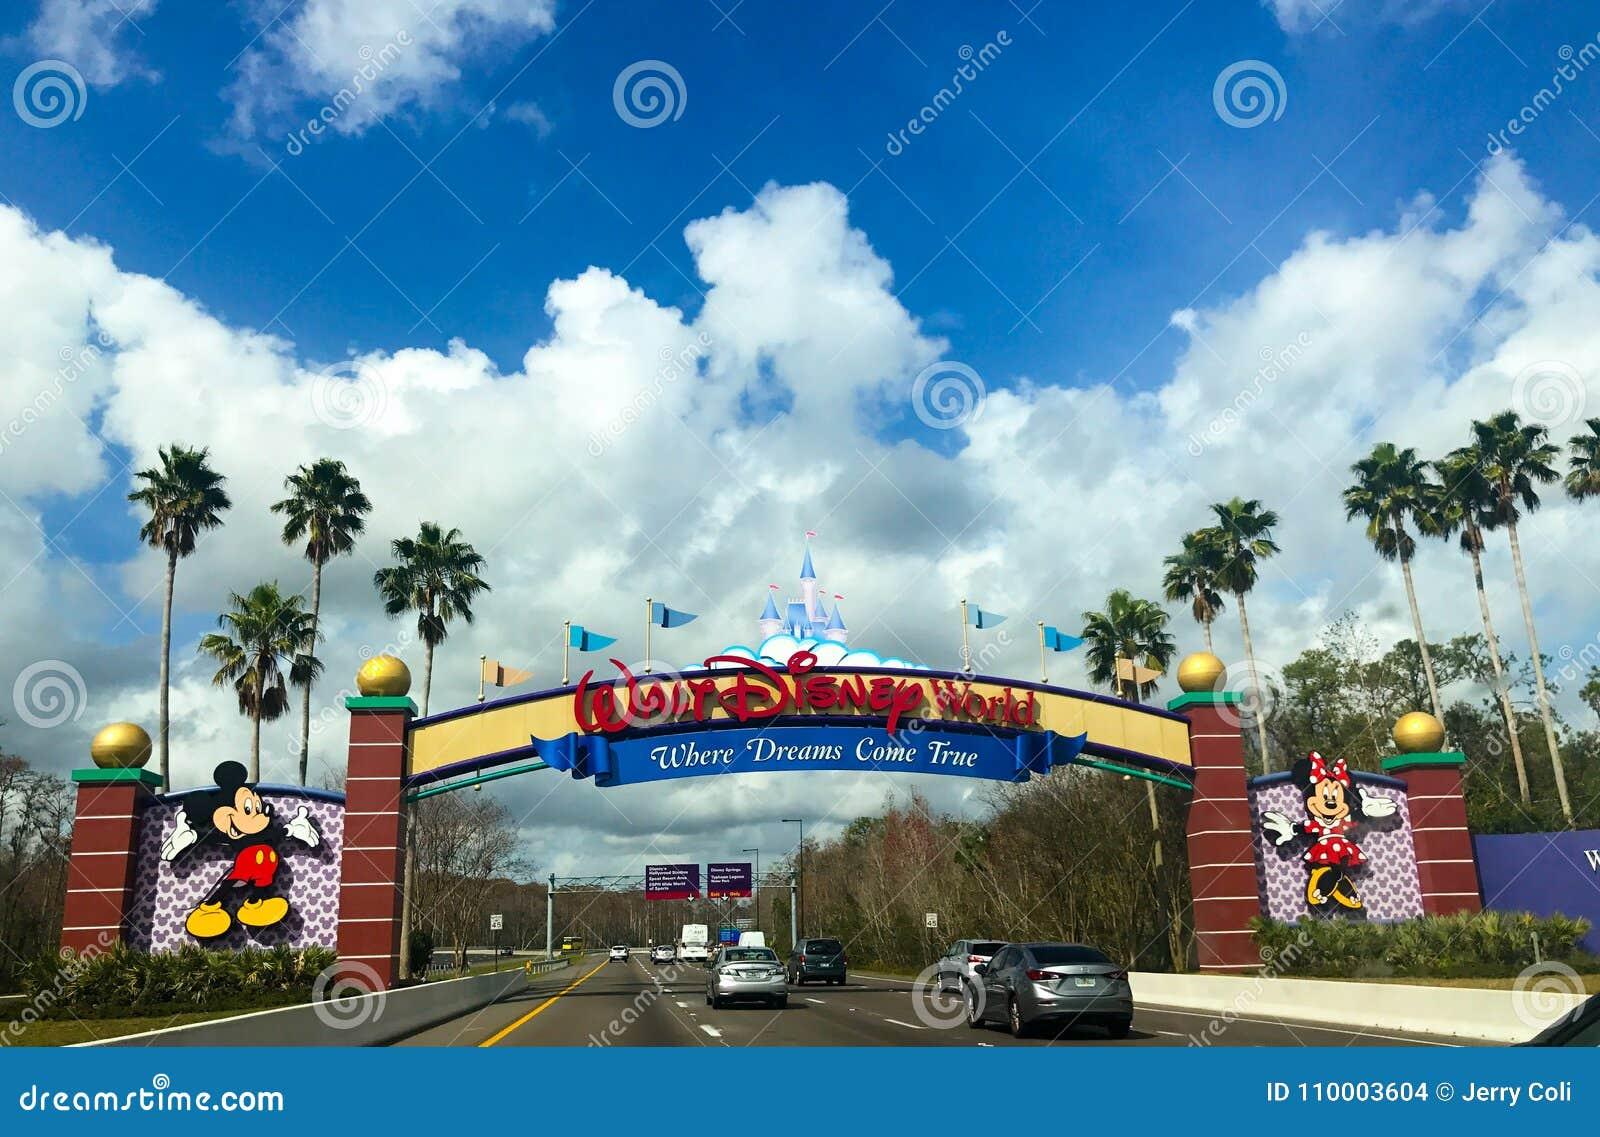 Entering Walt Disney World in Orlando, Florida.